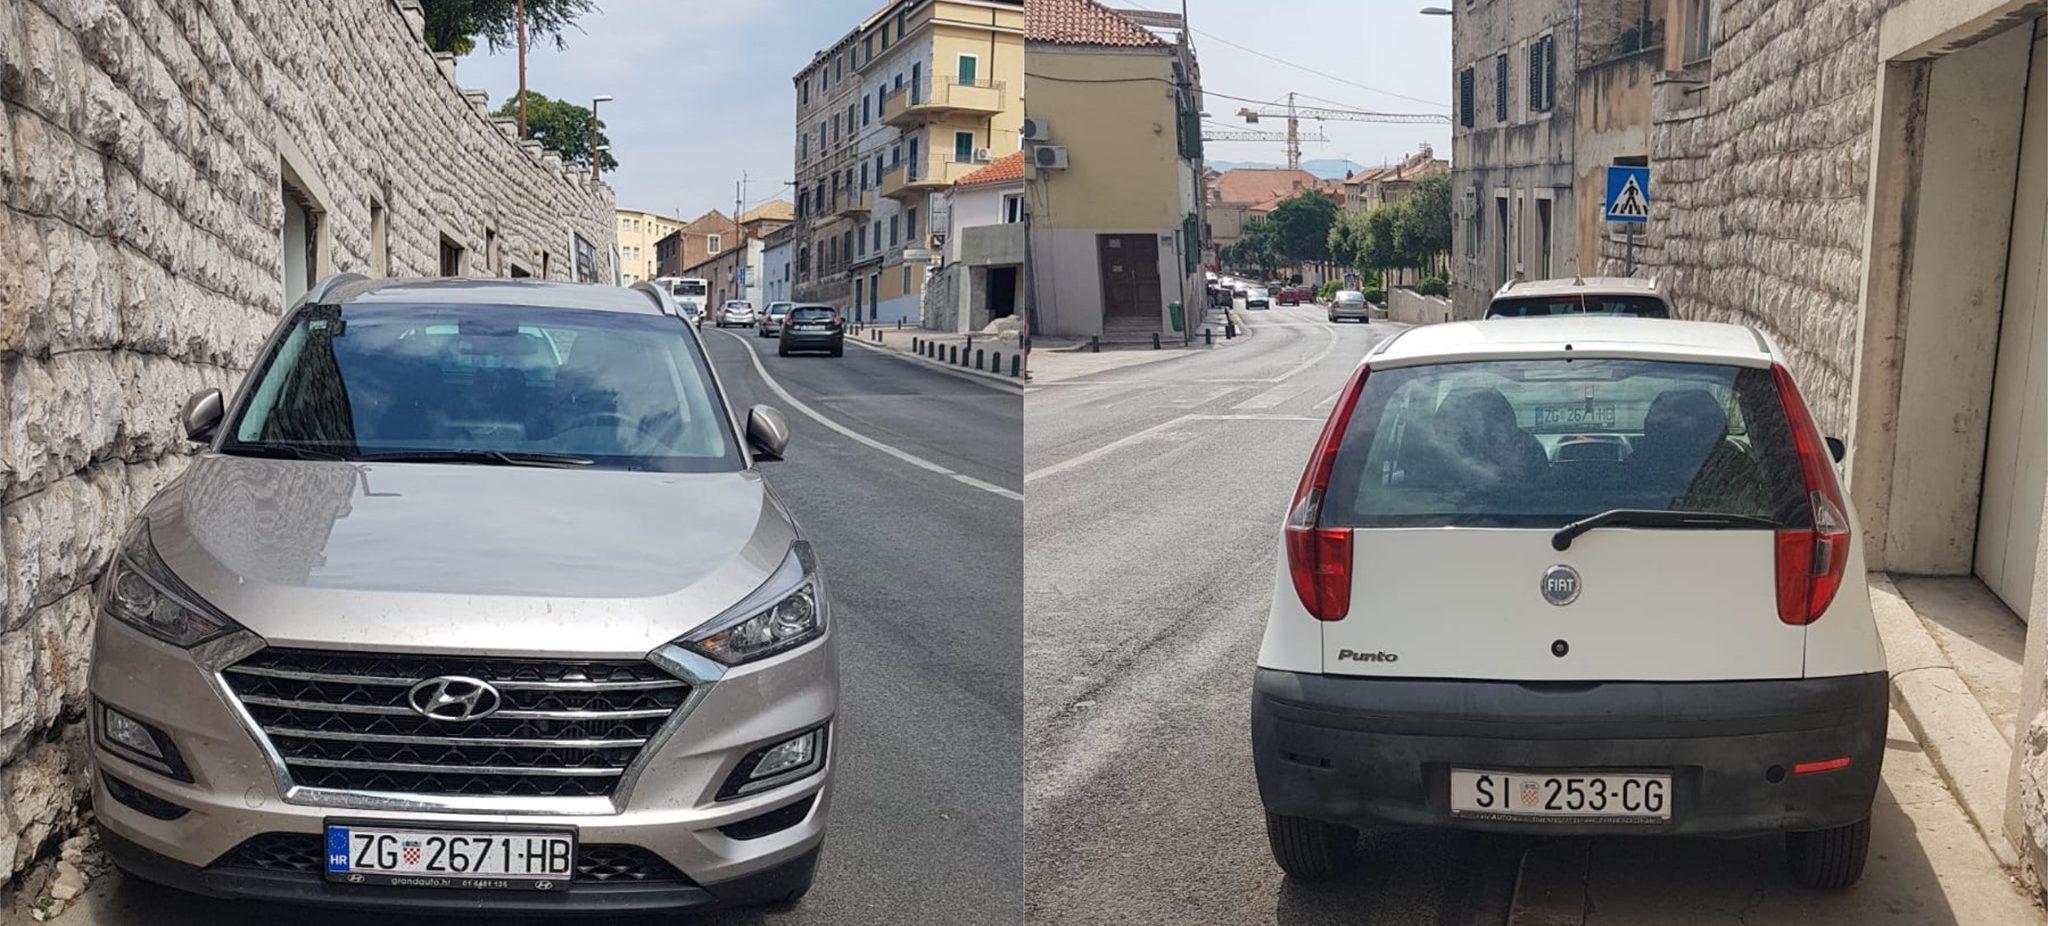 Borba titana u bezobraznosti parkiranja